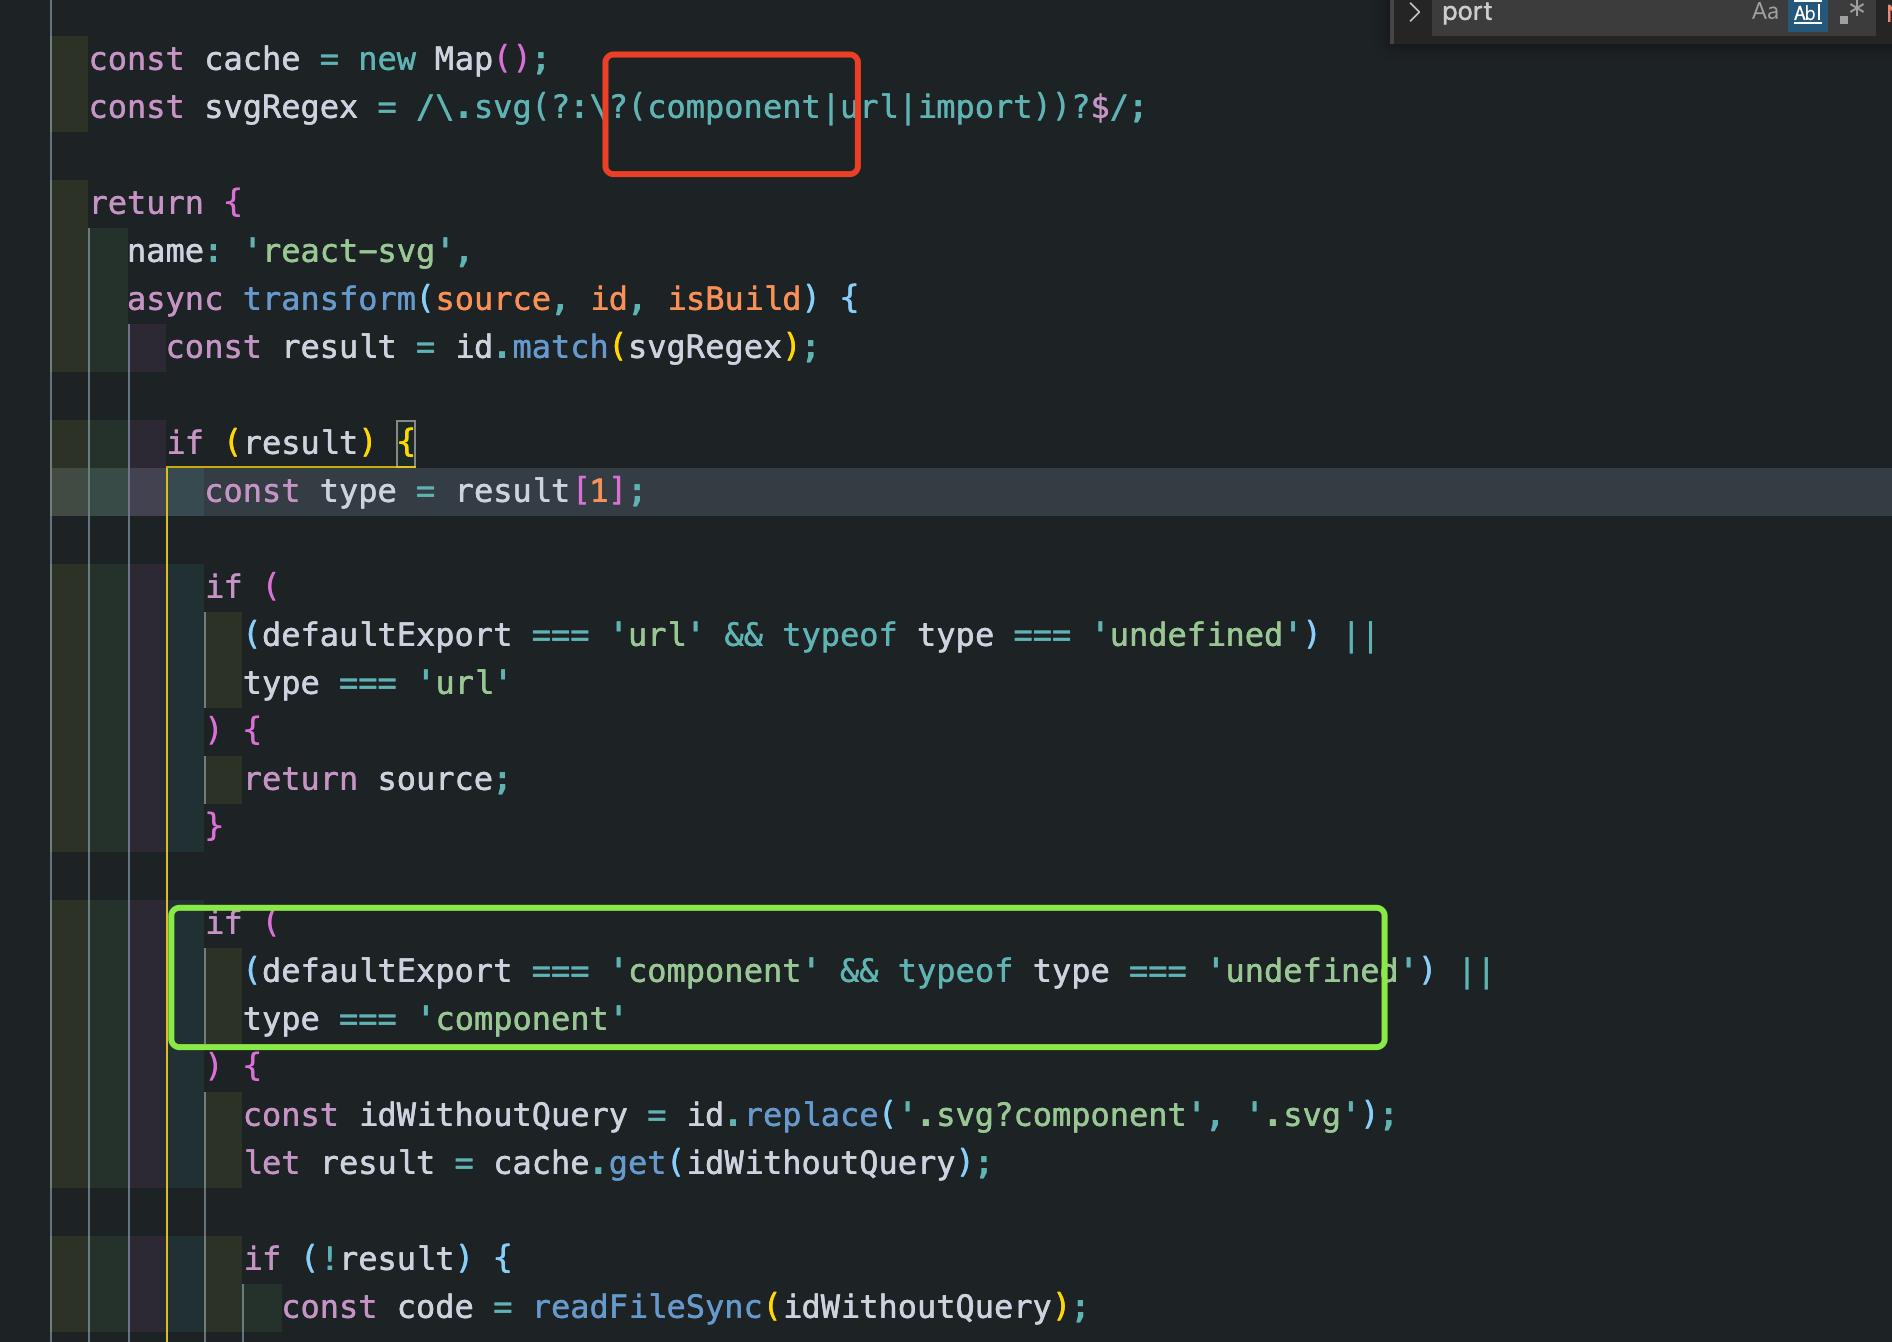 引入的 svg 文件需要加 ?component 作为后缀